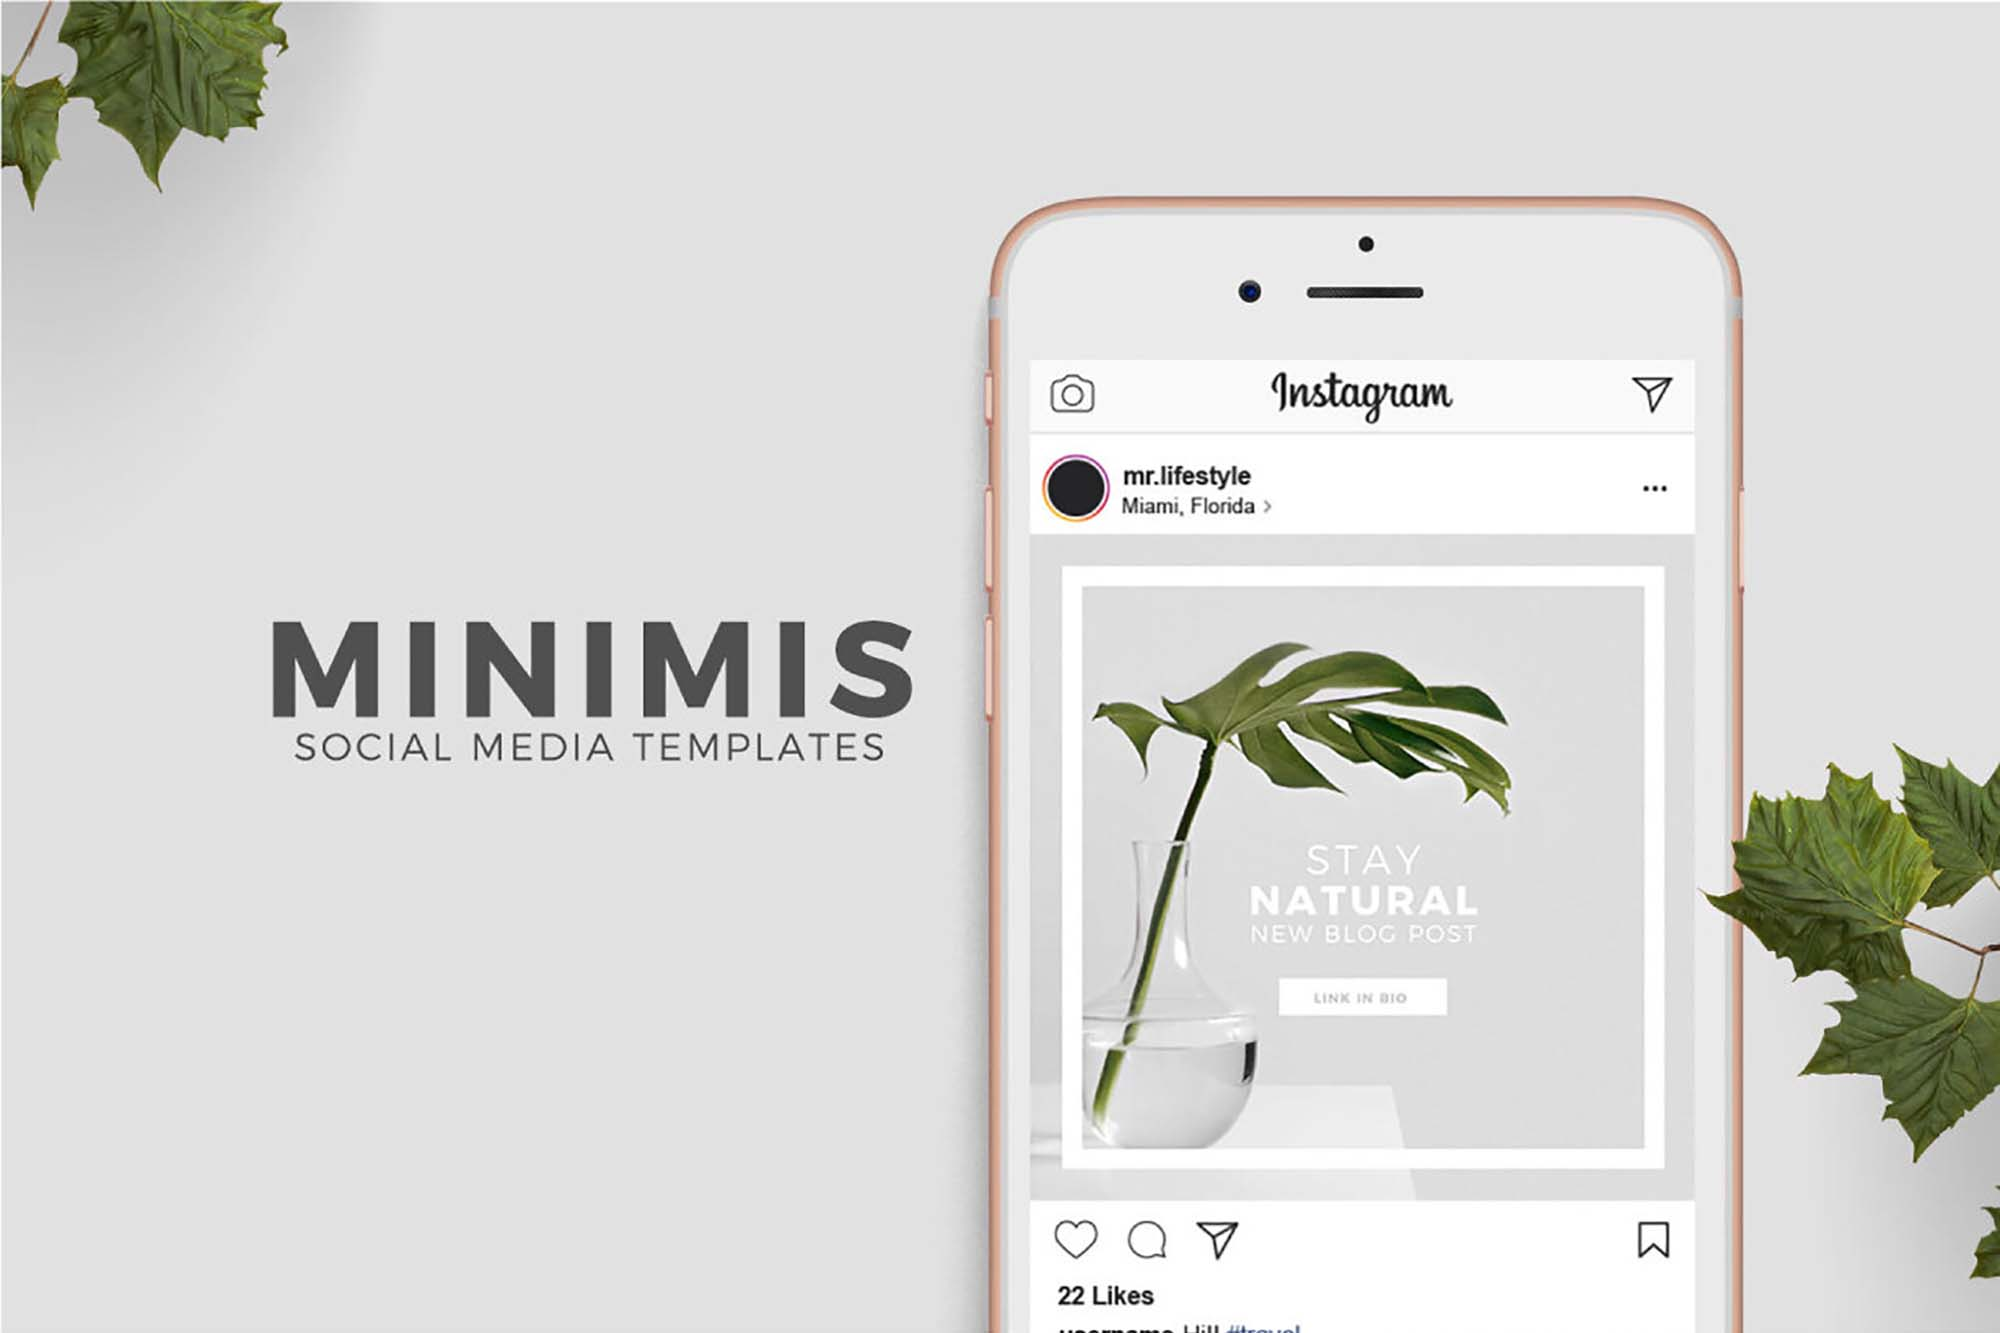 Minimis Instagram Social Media Templates